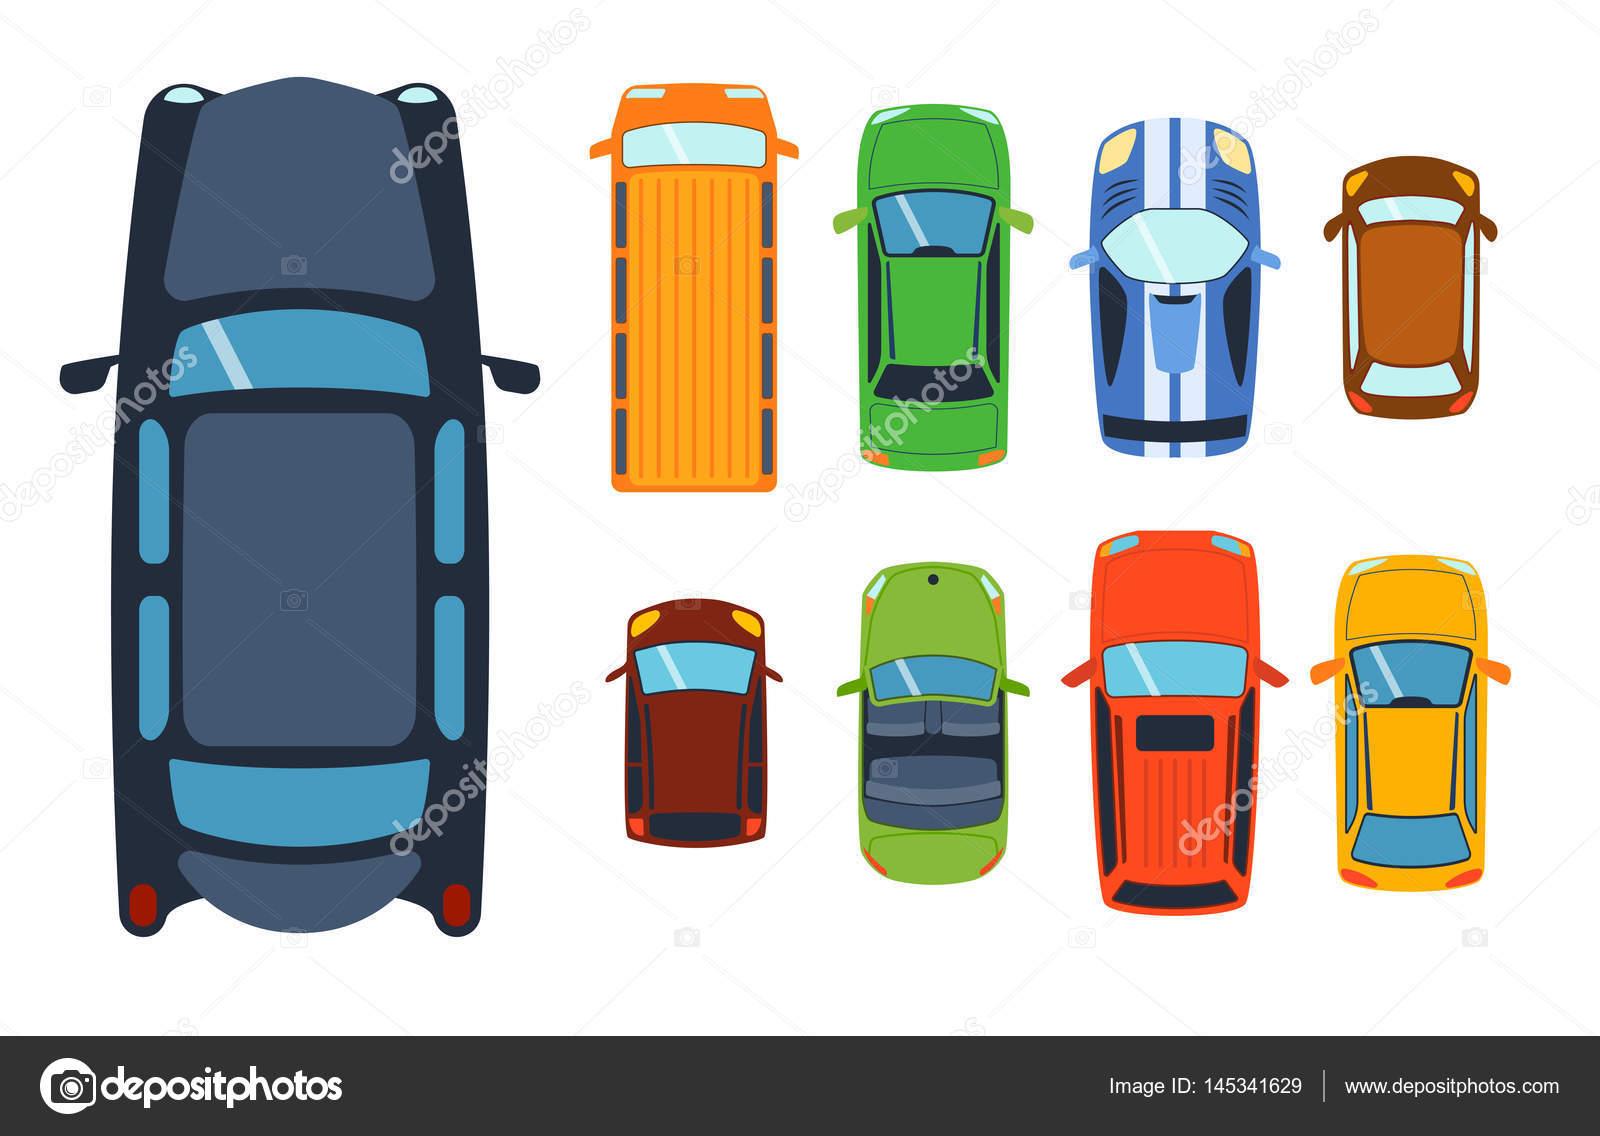 vista area superior en colorido coche juguetes diferentes recoleccin automvil transporte y coleccin rueda transporte diseo